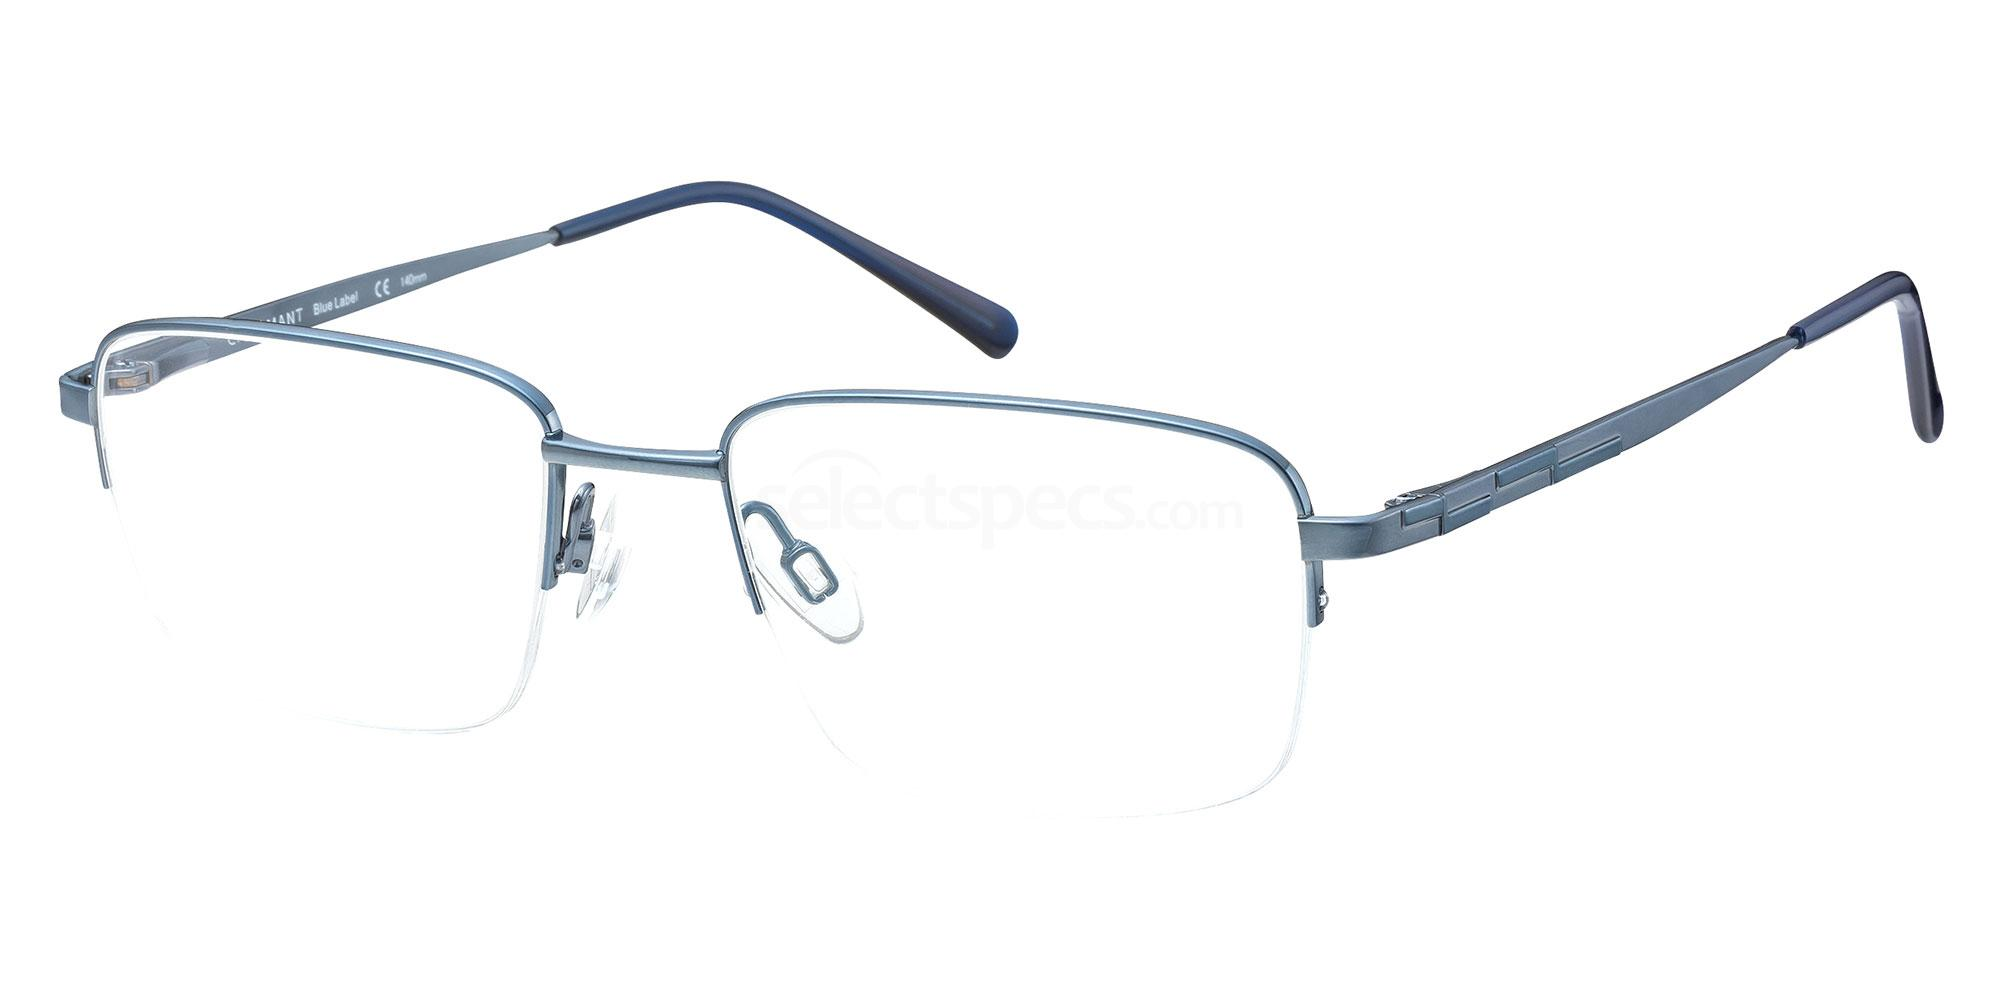 BL CH16123 Glasses, Charmant Blue Label